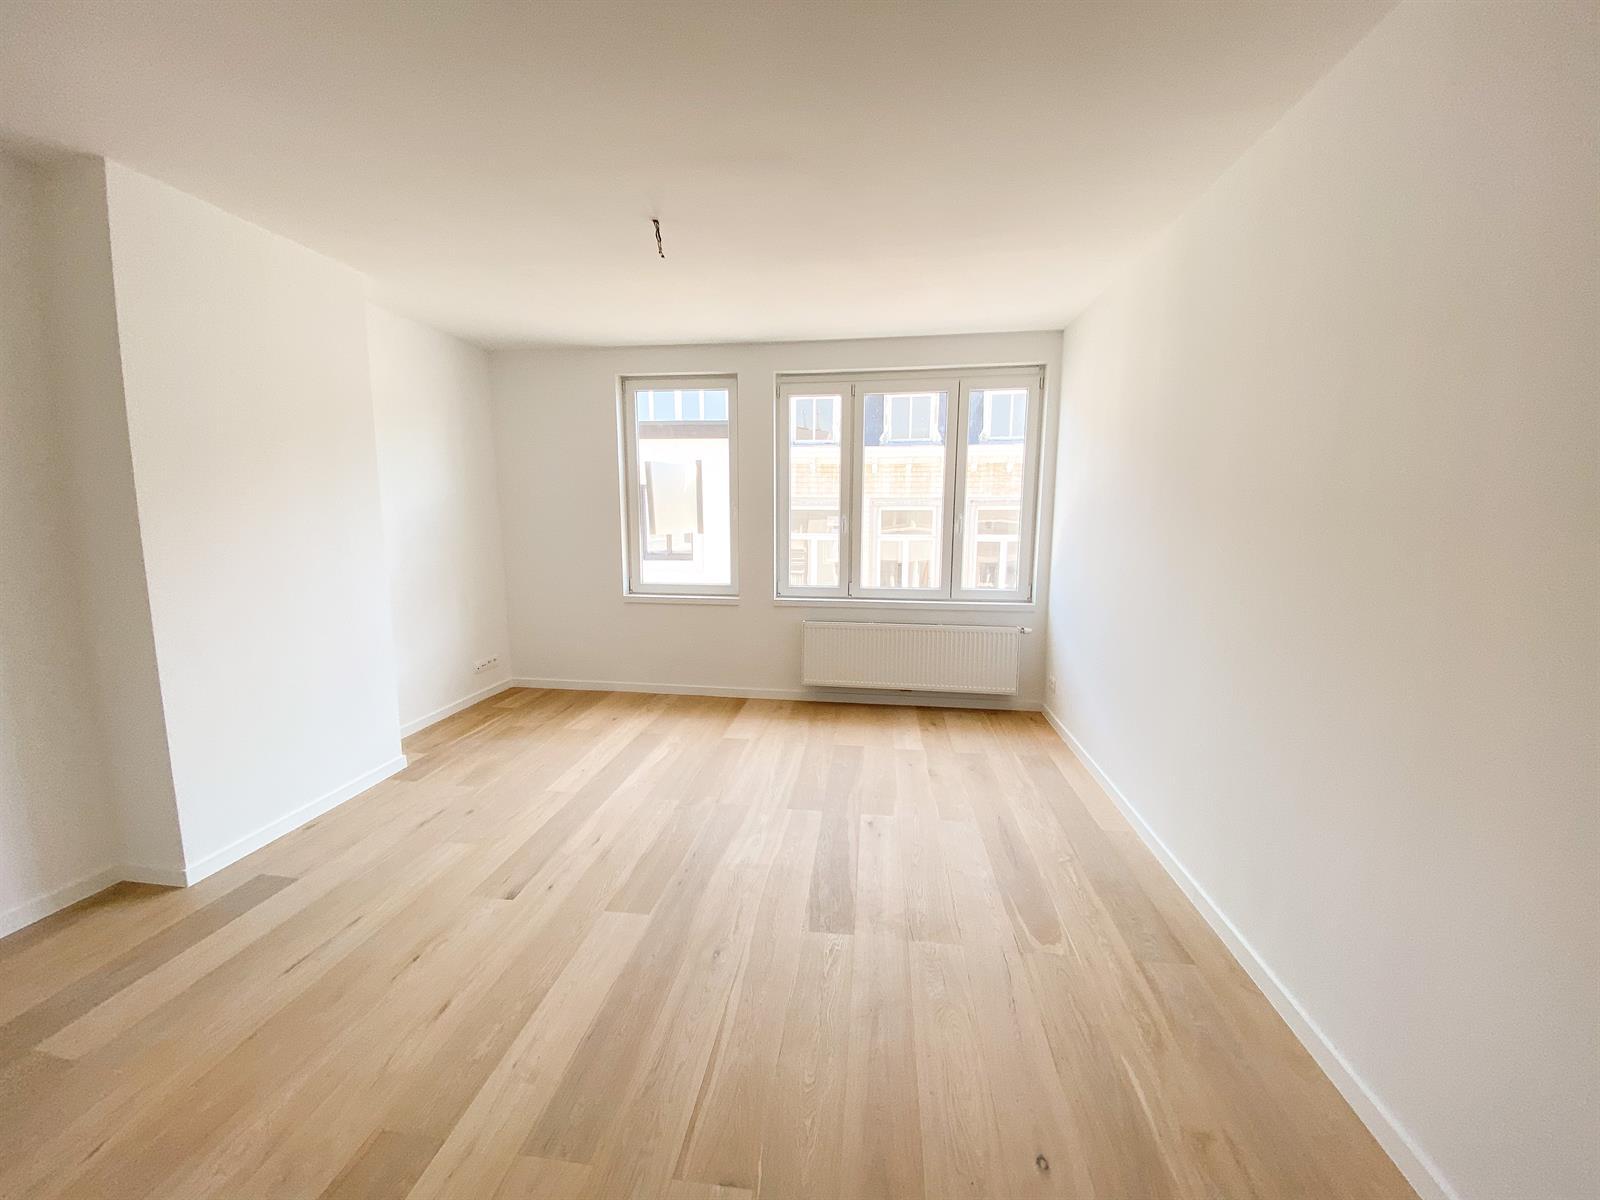 Appartement - Liège - #4045839-4